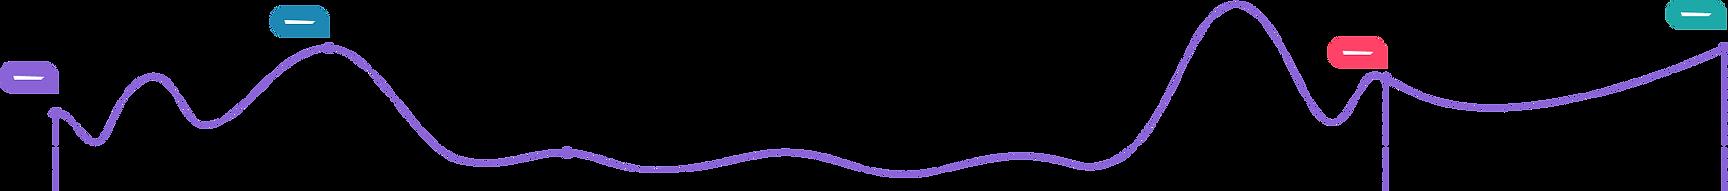 Line -min.png